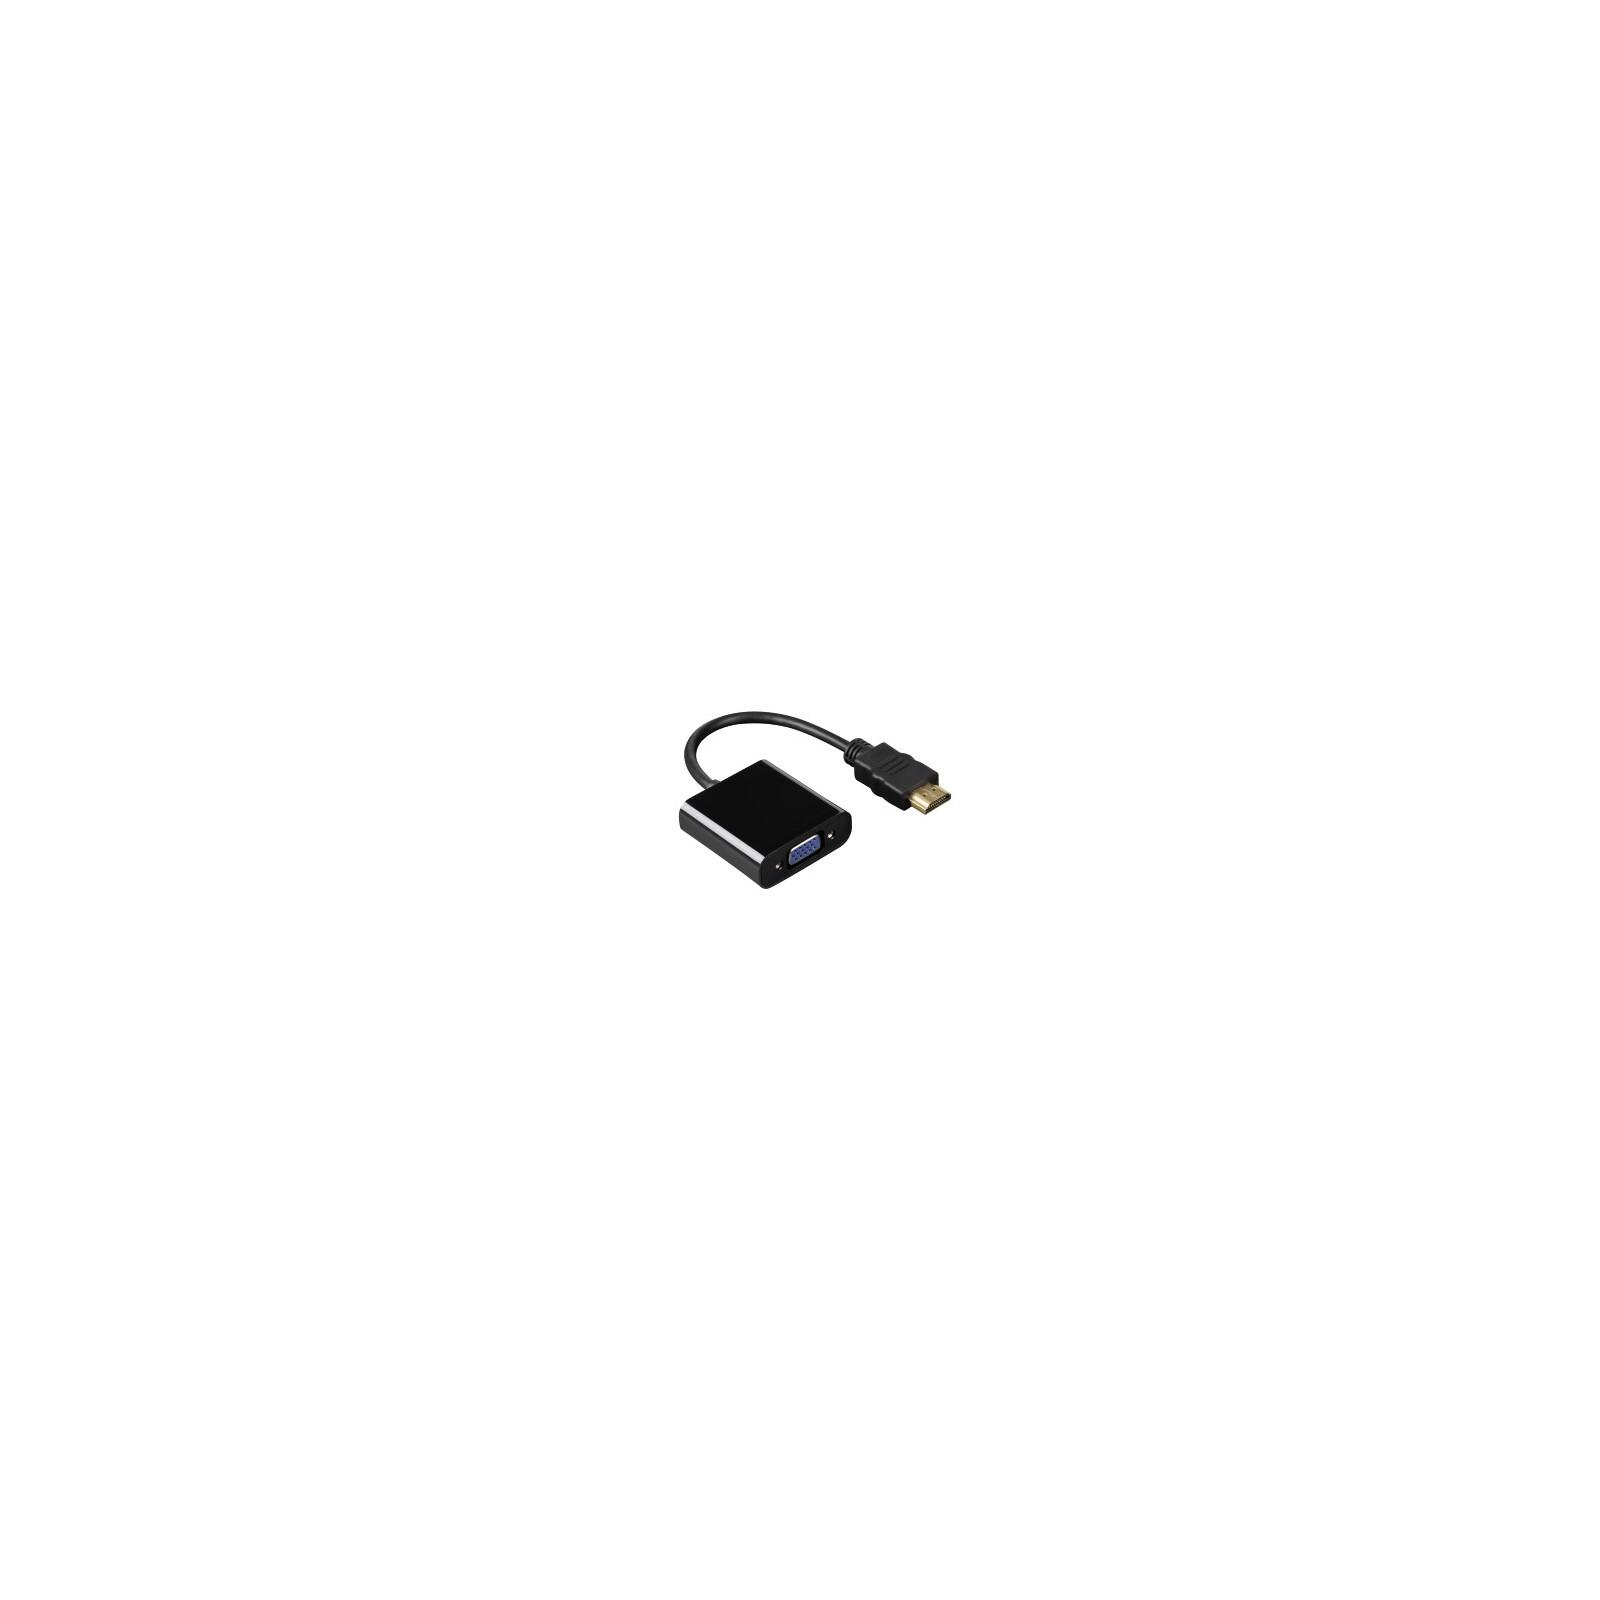 Hama 83215 HDMI-Konverter für VGA